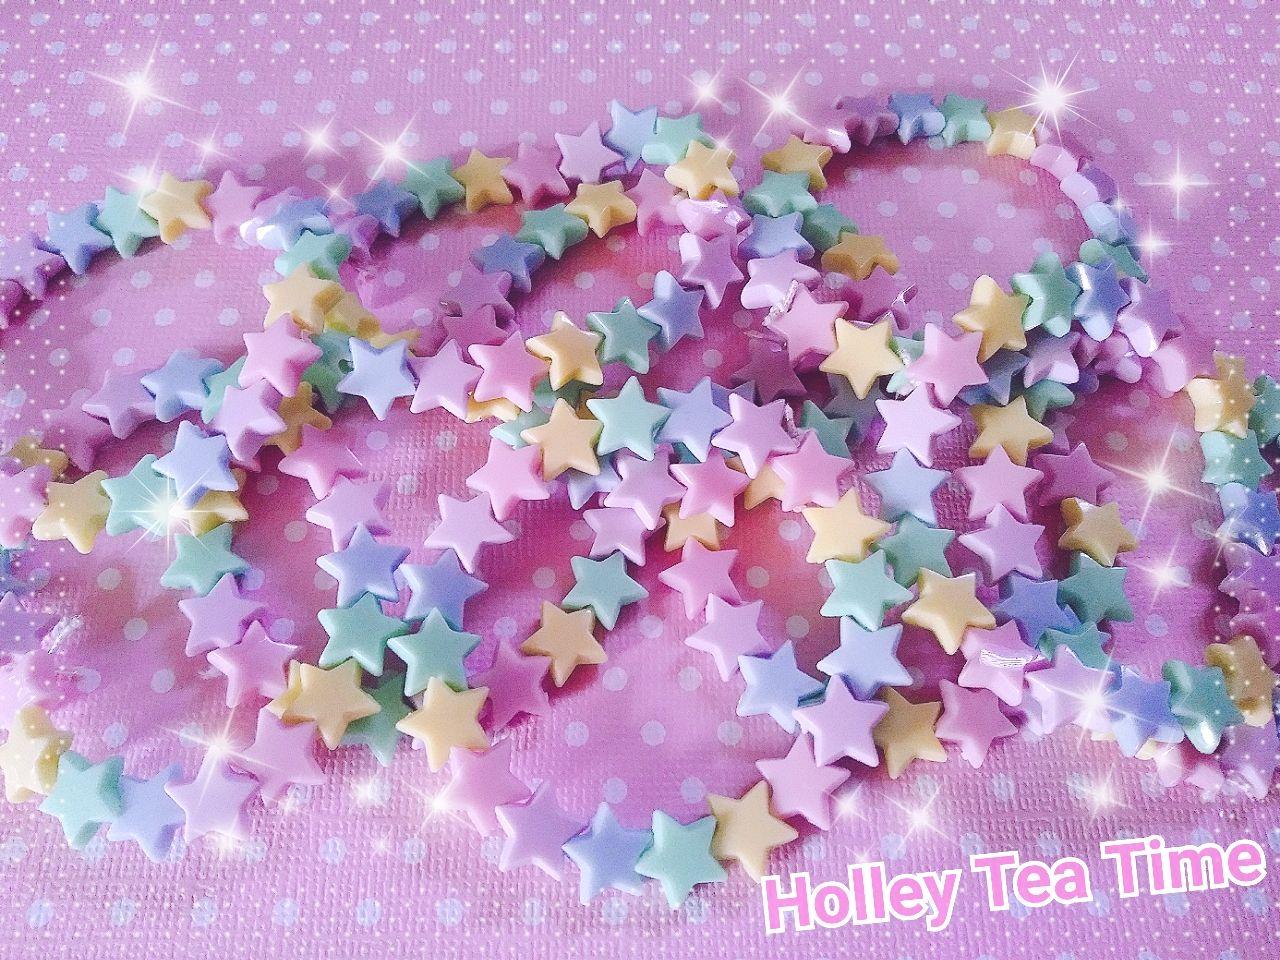 Magical J Fashion Party Kei Cute Magical Girl Pastel bracelet, Pastel Bows bracelet Fairy kei Kawaii bracelets kandi